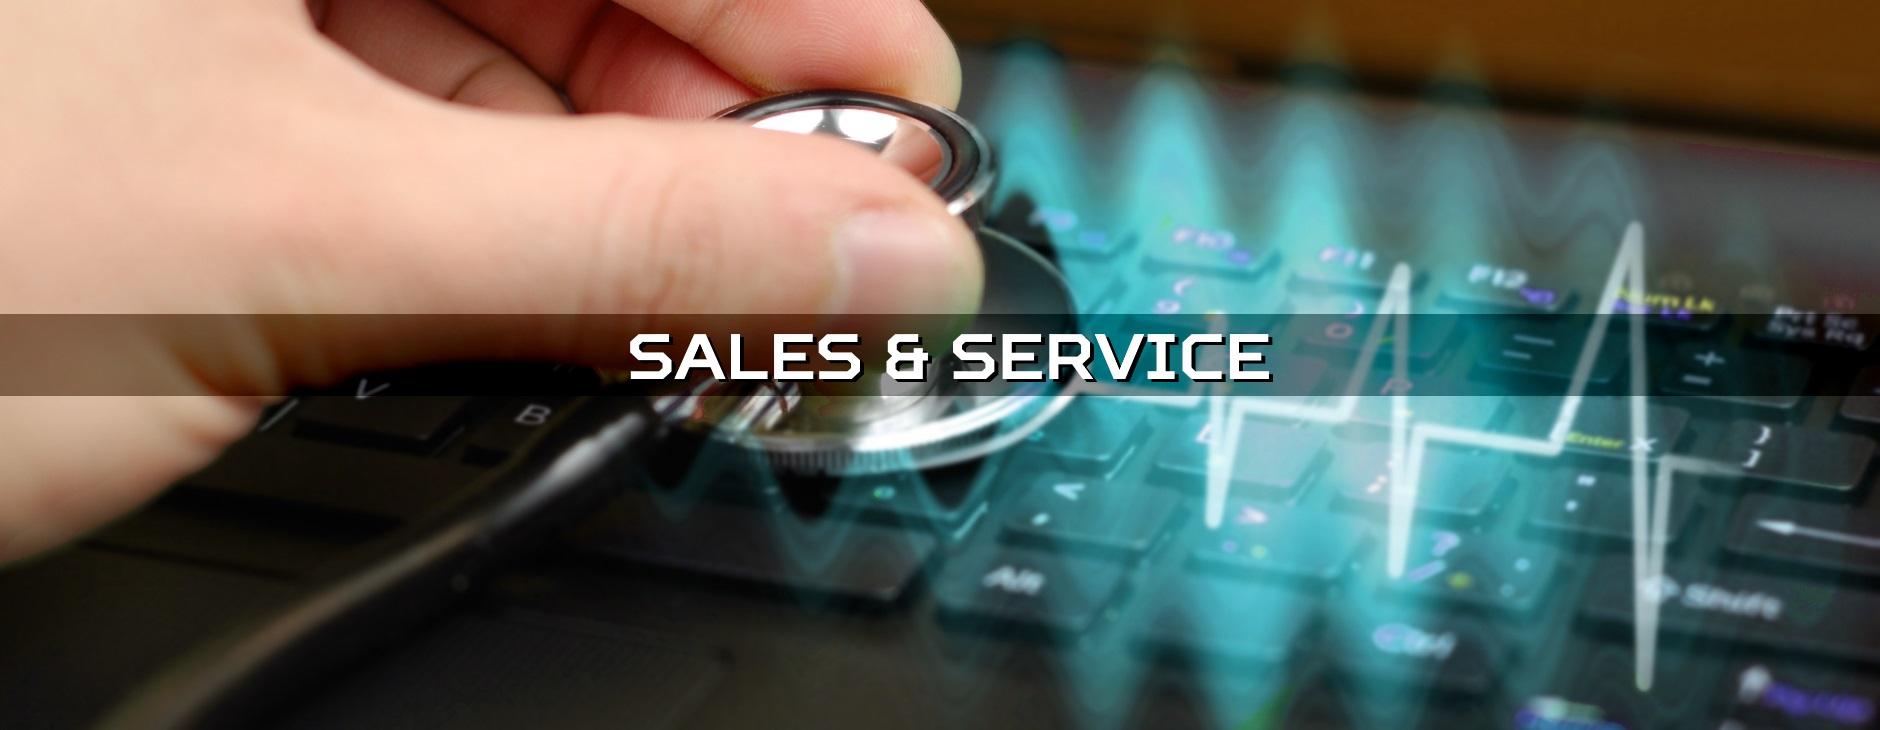 Sales-Service-4.jpg